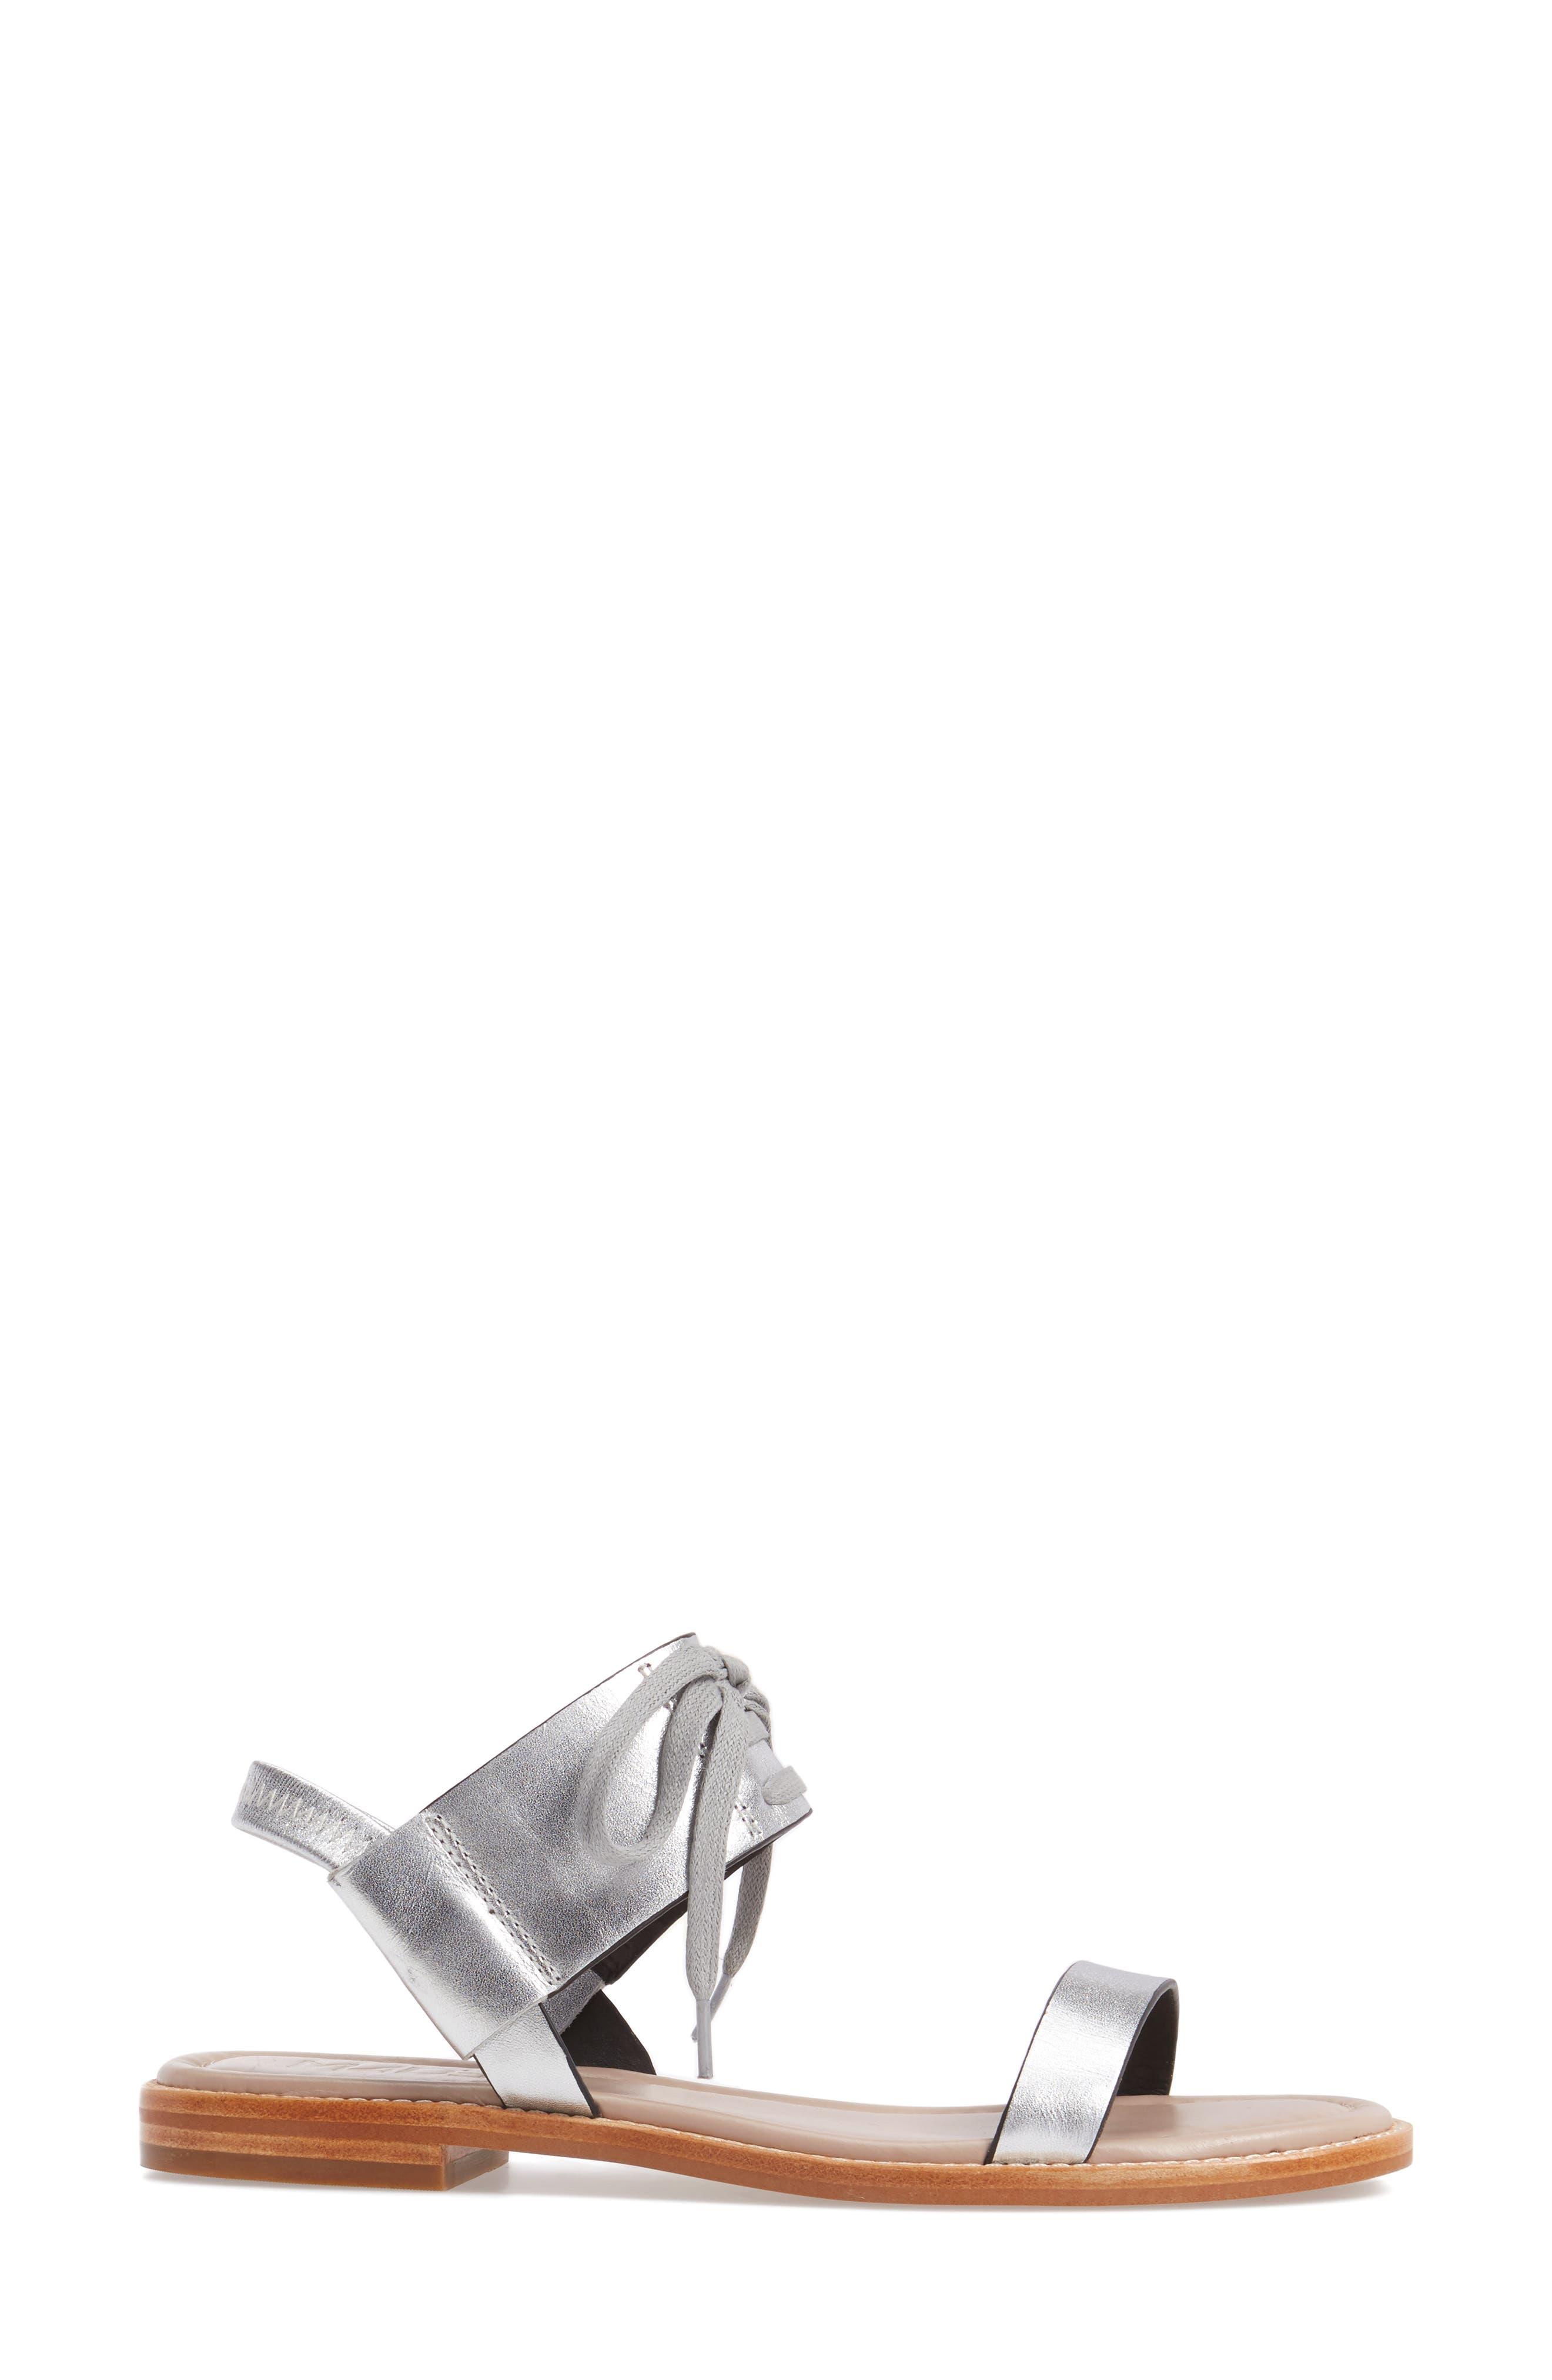 M4D3 Hailey Slingback Sandal,                             Alternate thumbnail 3, color,                             Silver Leather